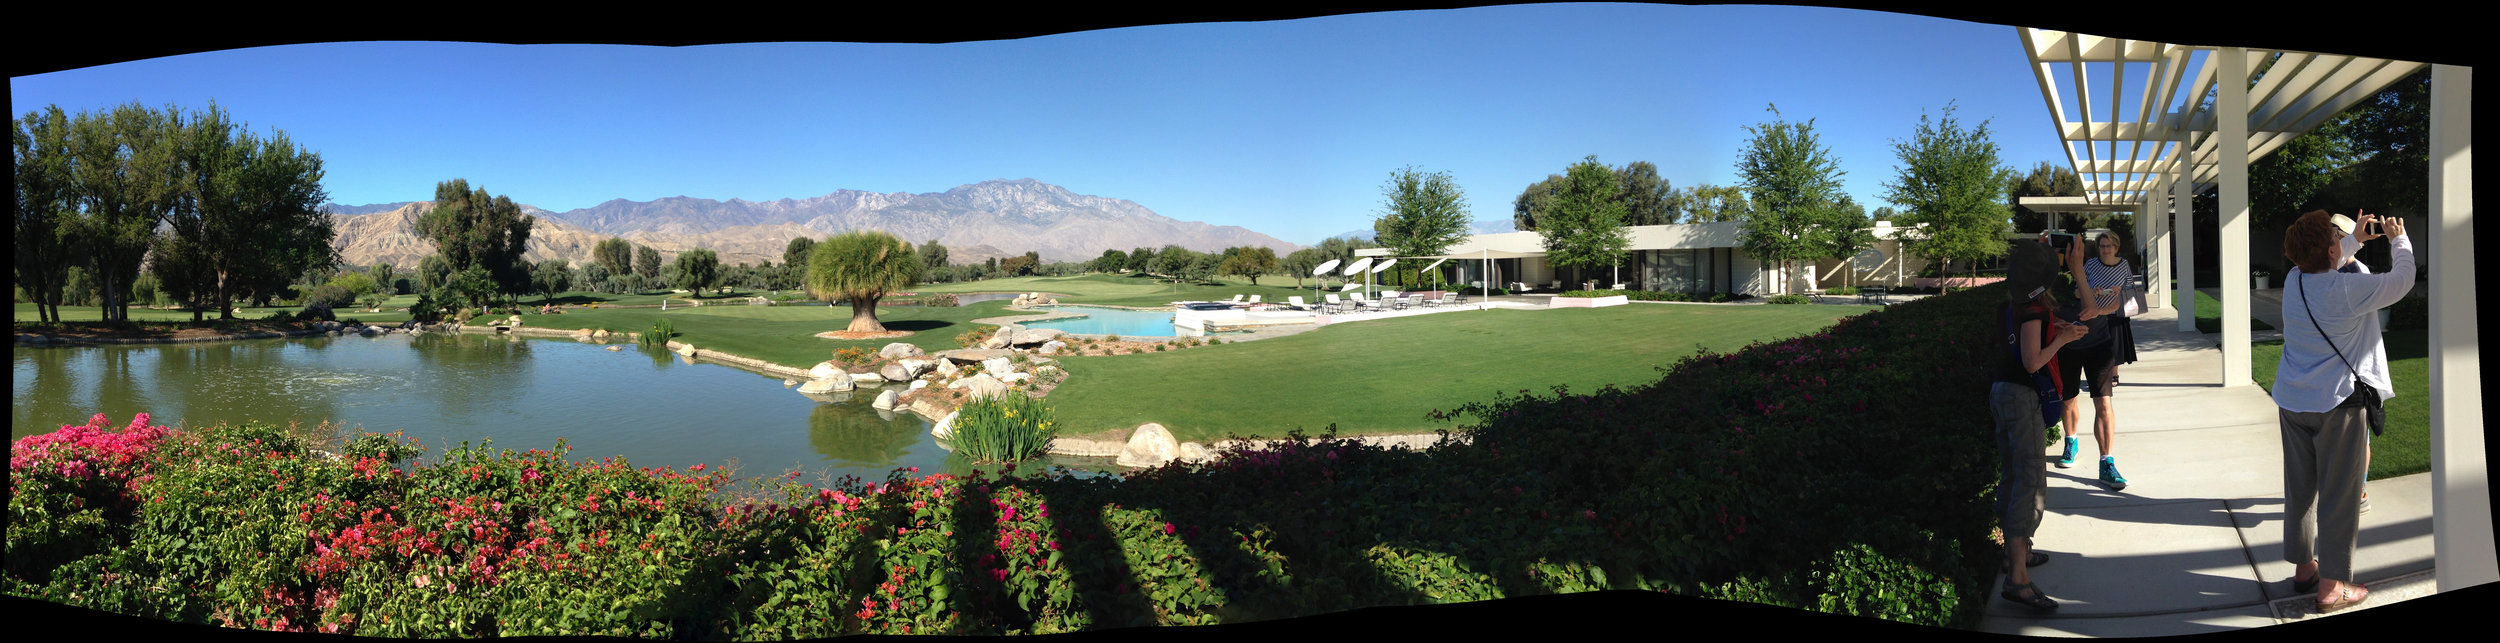 2015_03_Kcy_visit_to_Sunnylands_Palm_Springs.jpg